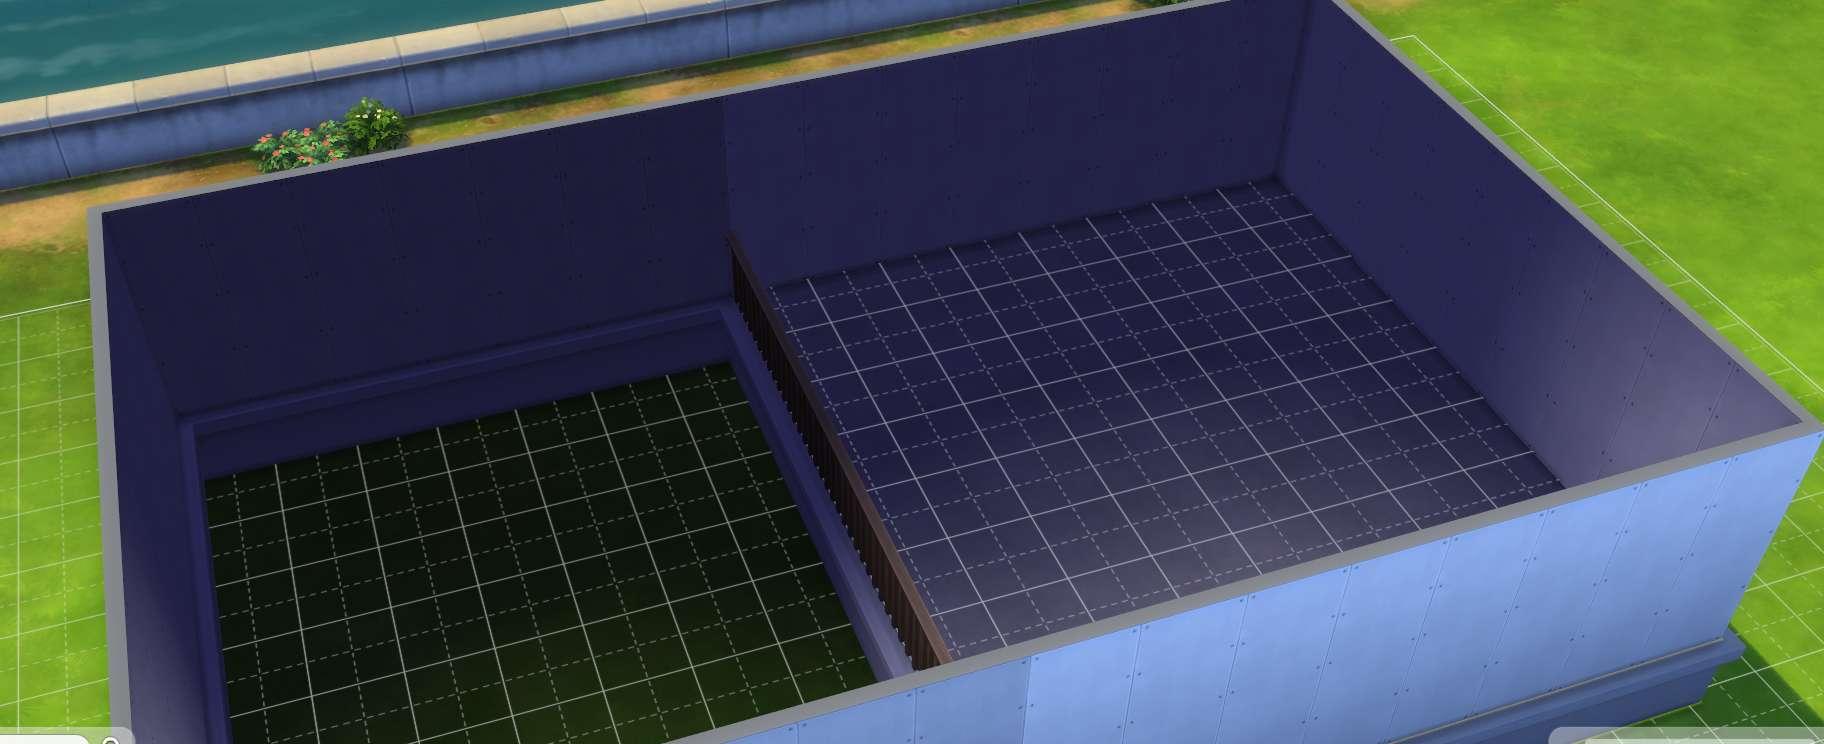 Sims 4 Building Split Levels Lofts And Dormer Windows